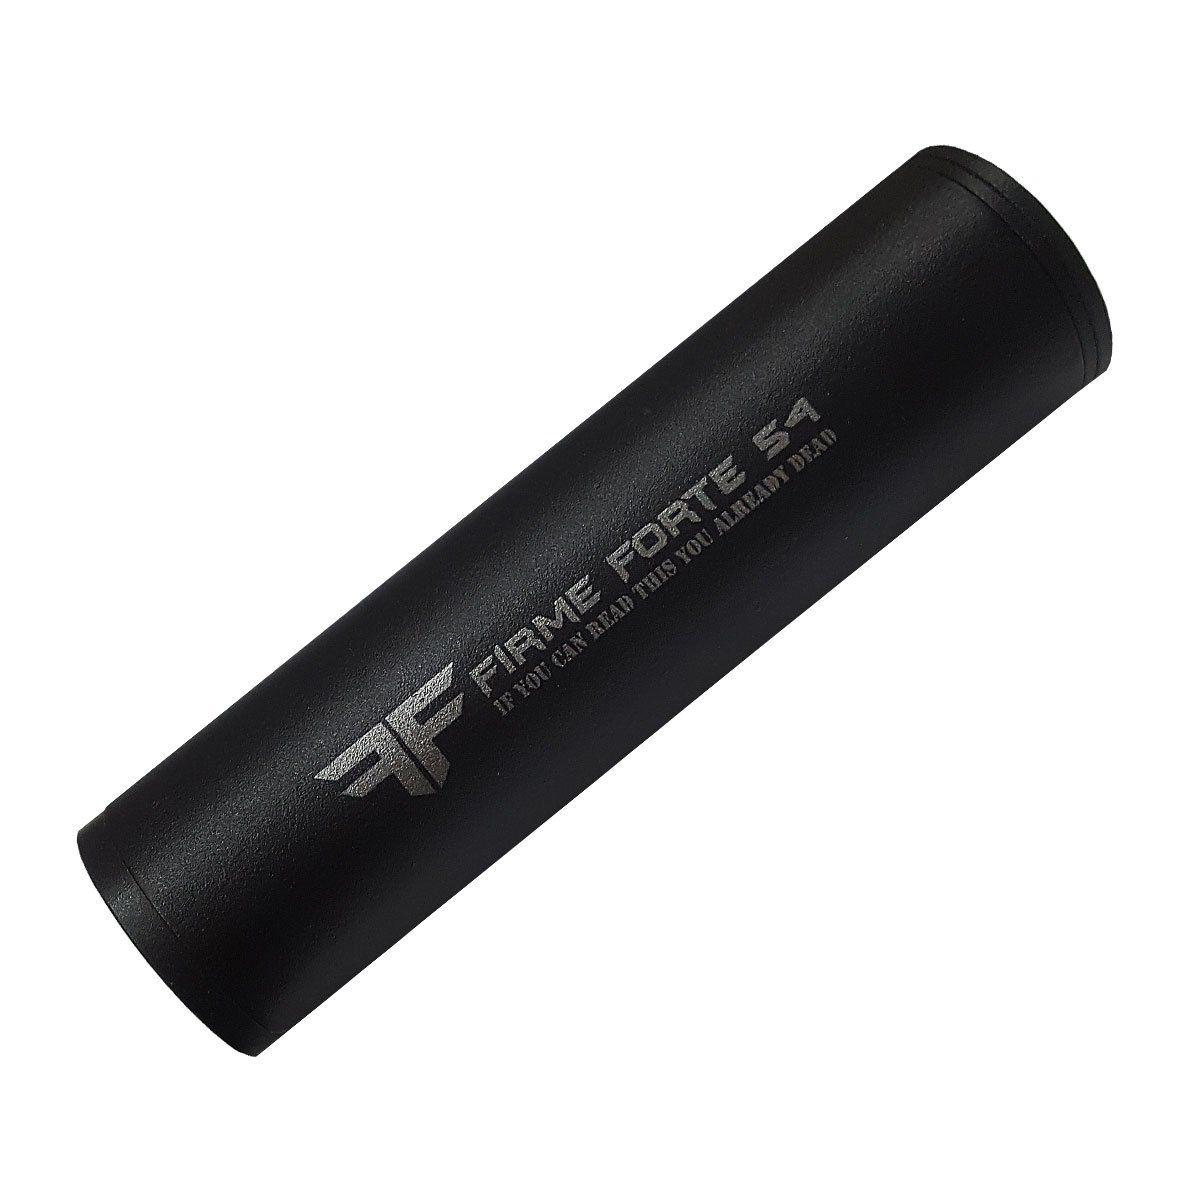 Silenciador para Airsoft Universal Rosca Esq/Dir Firme&Forte Preto